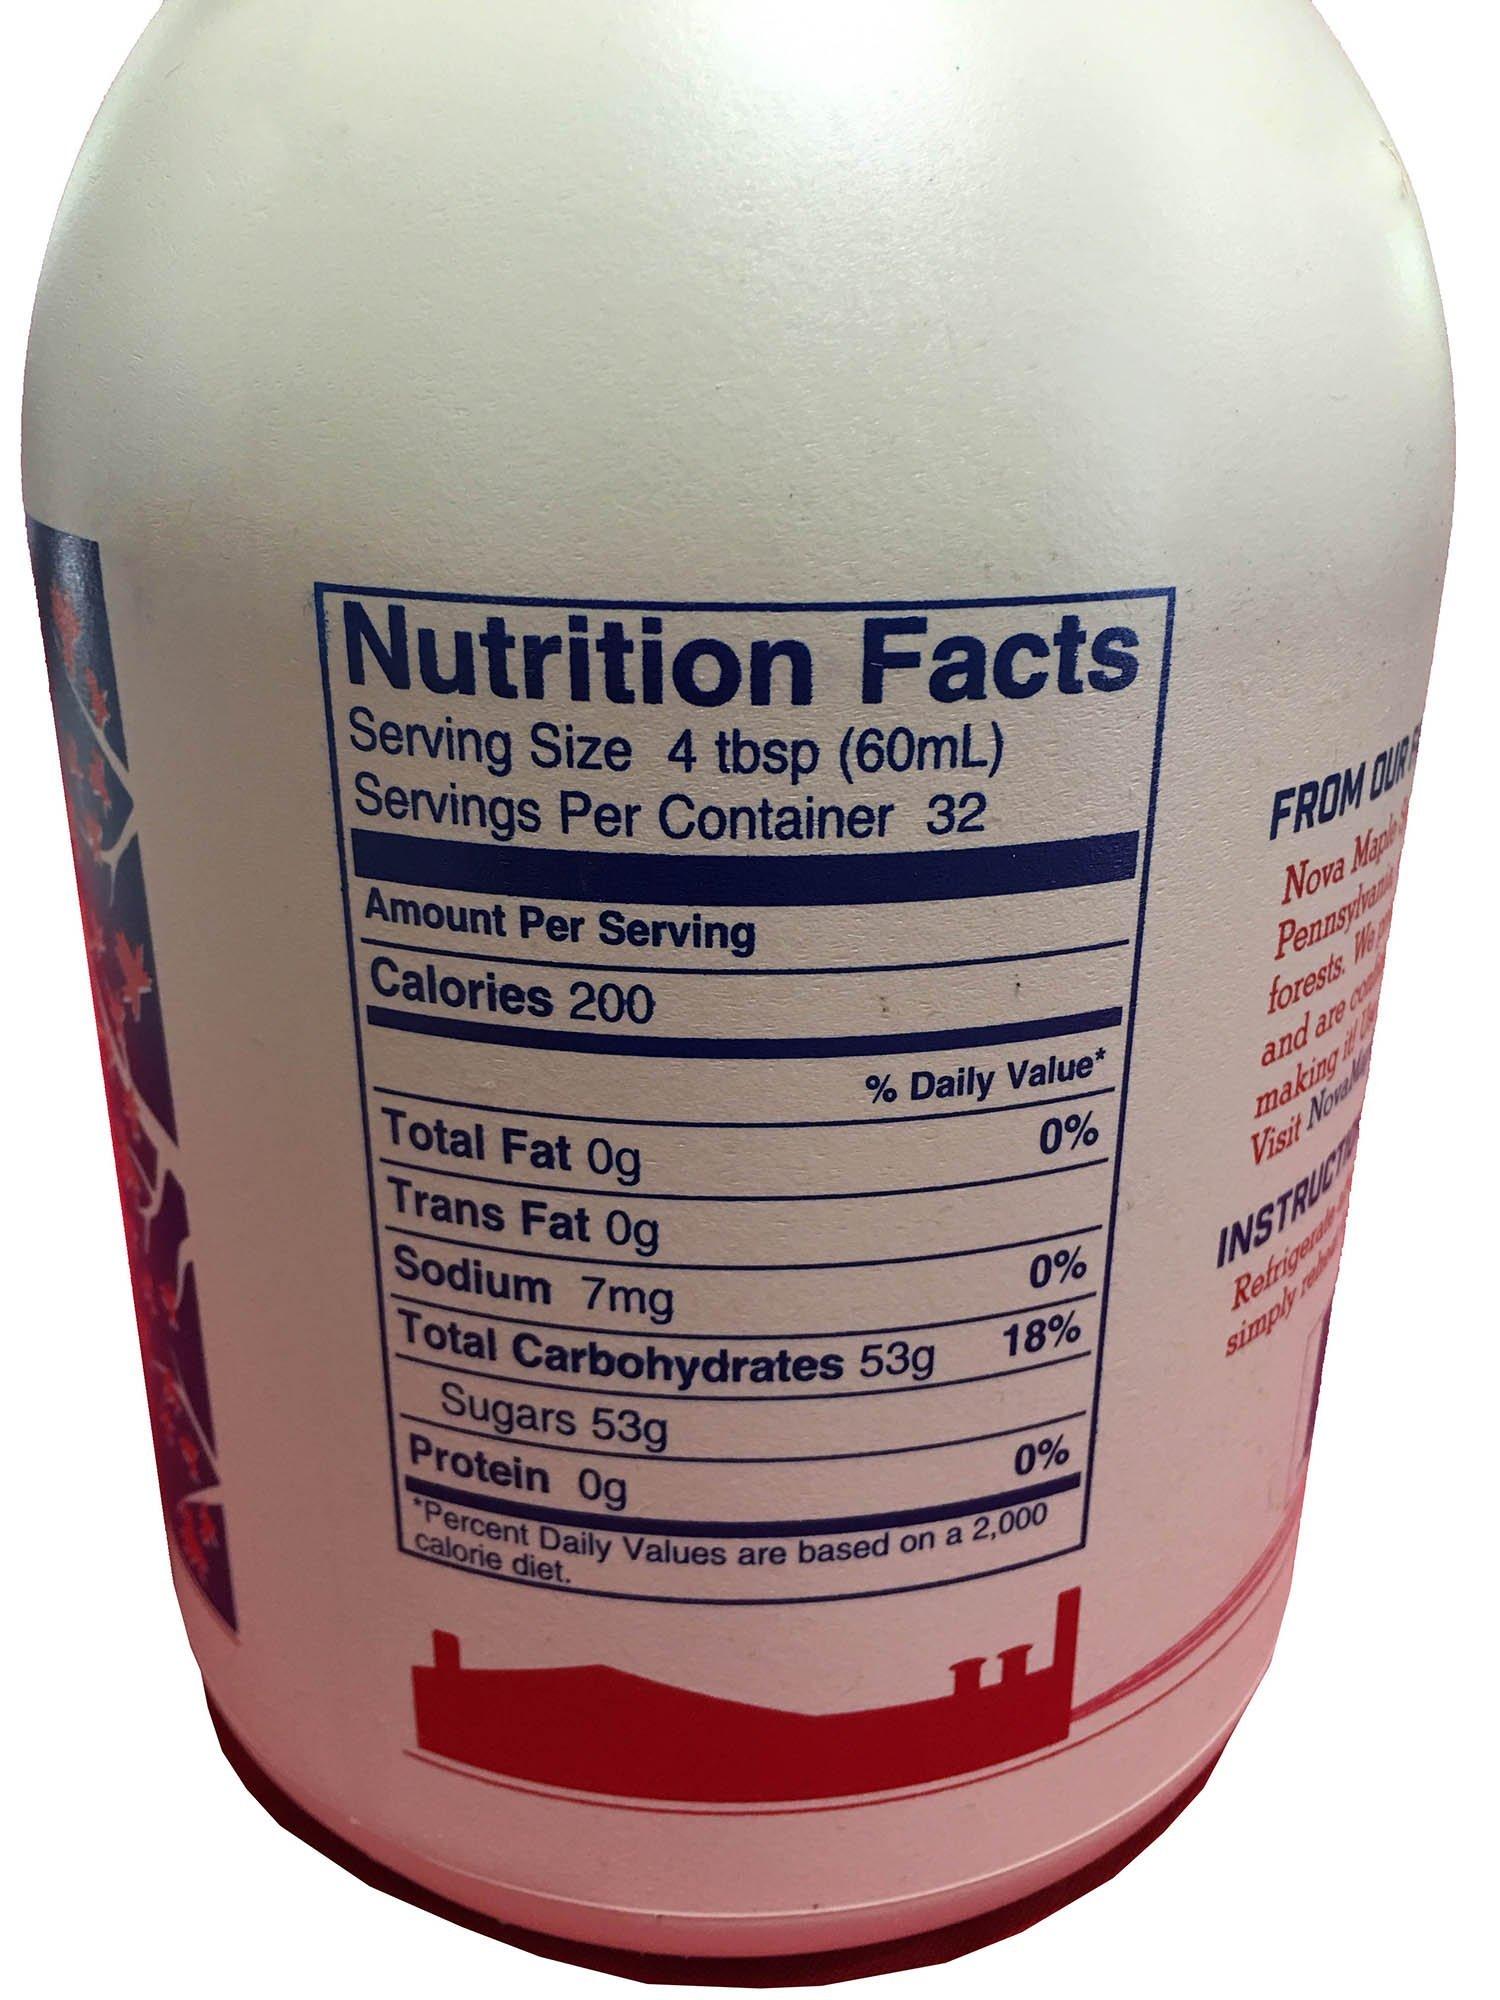 Nova Maple Syrup - Pure Grade-A Maple Syrup (Gallon) by Nova Maple Syrup (Image #3)